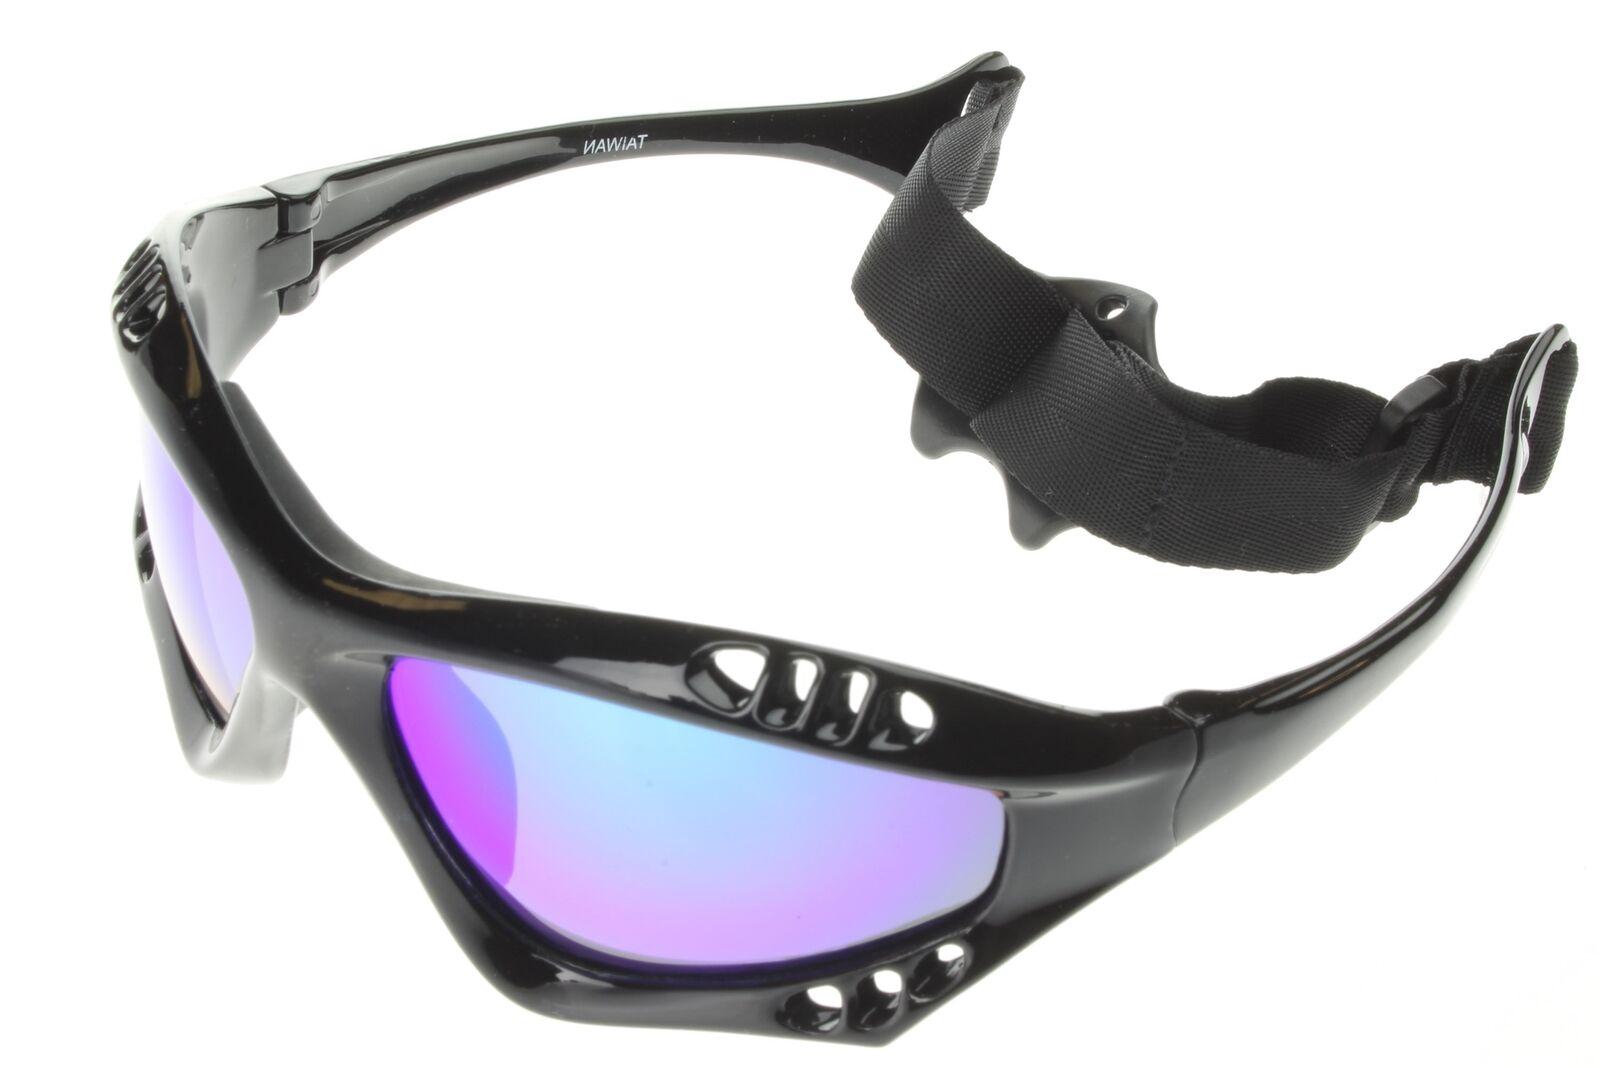 72990af5a94 Details about Polarized Water Sport Sunglasses Kitesurfing Jetski Boating  Case Green Mir 603